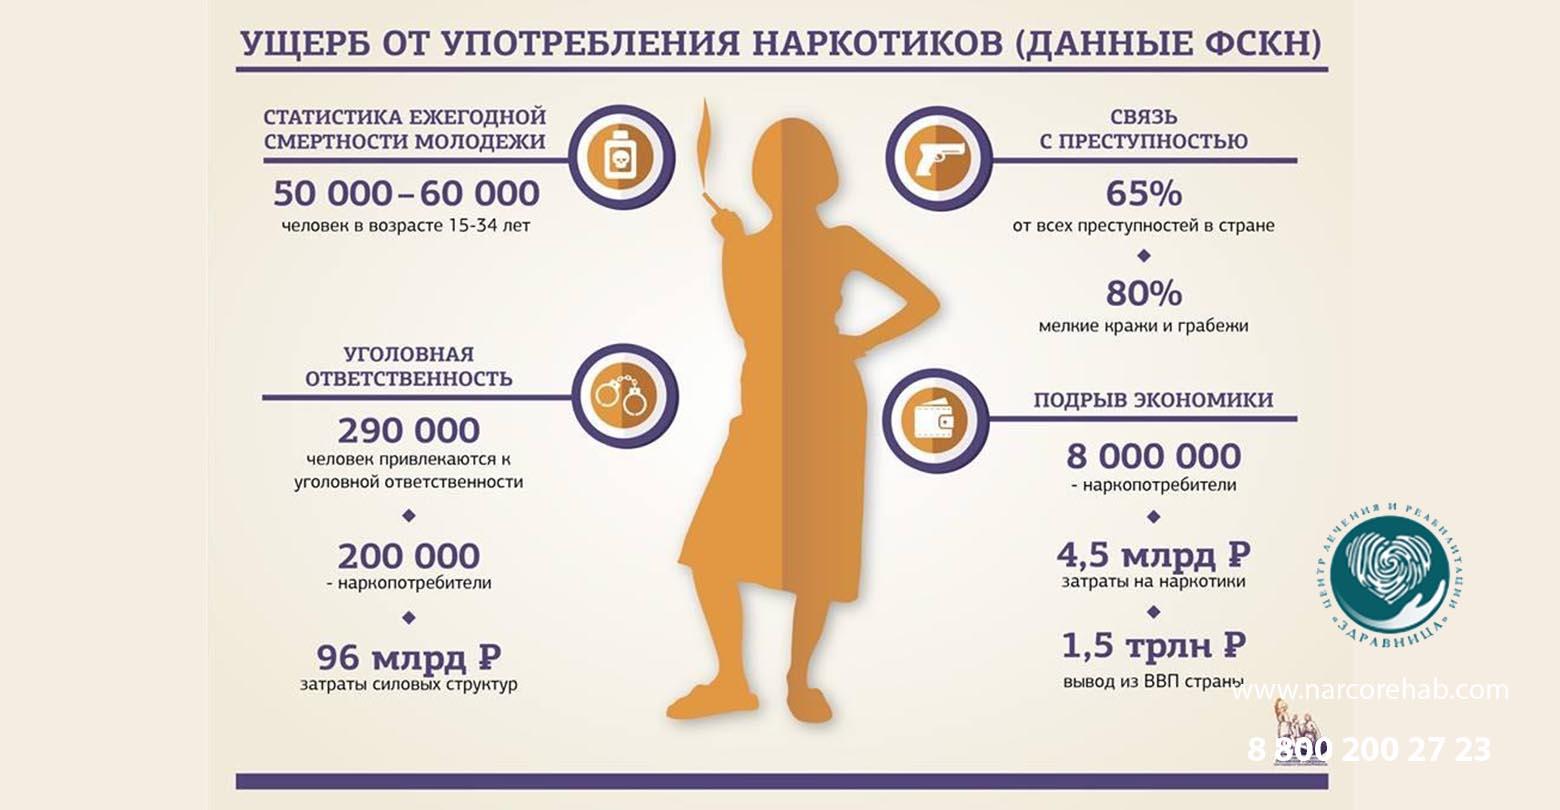 Статистика наркомании в России 2020-2021 года